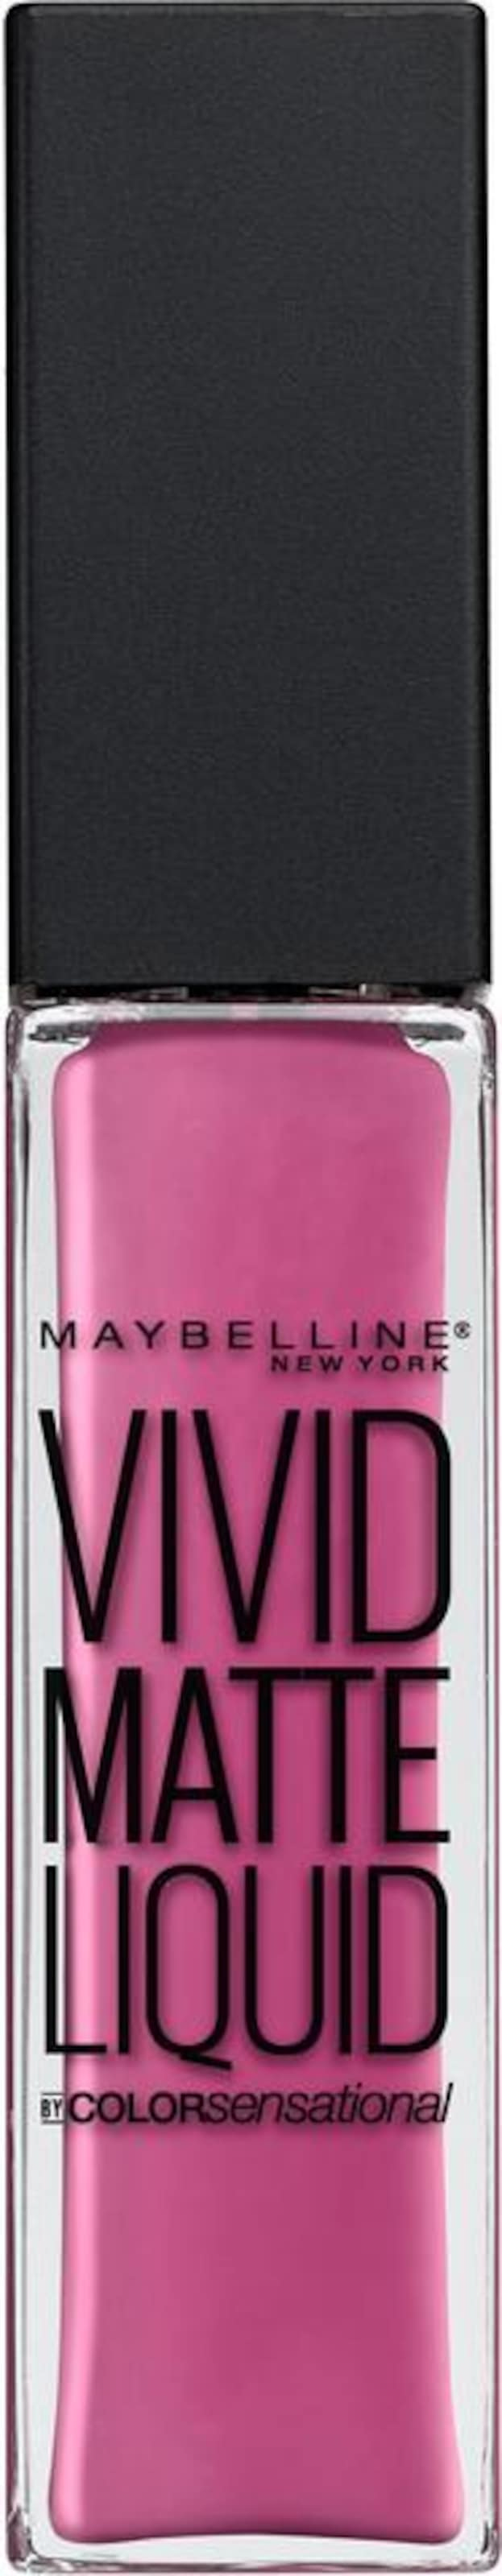 New Matte Matte York Lippenstift York MAYBELLINE New Liquid' 'Vivid MAYBELLINE 'Vivid SdXxC